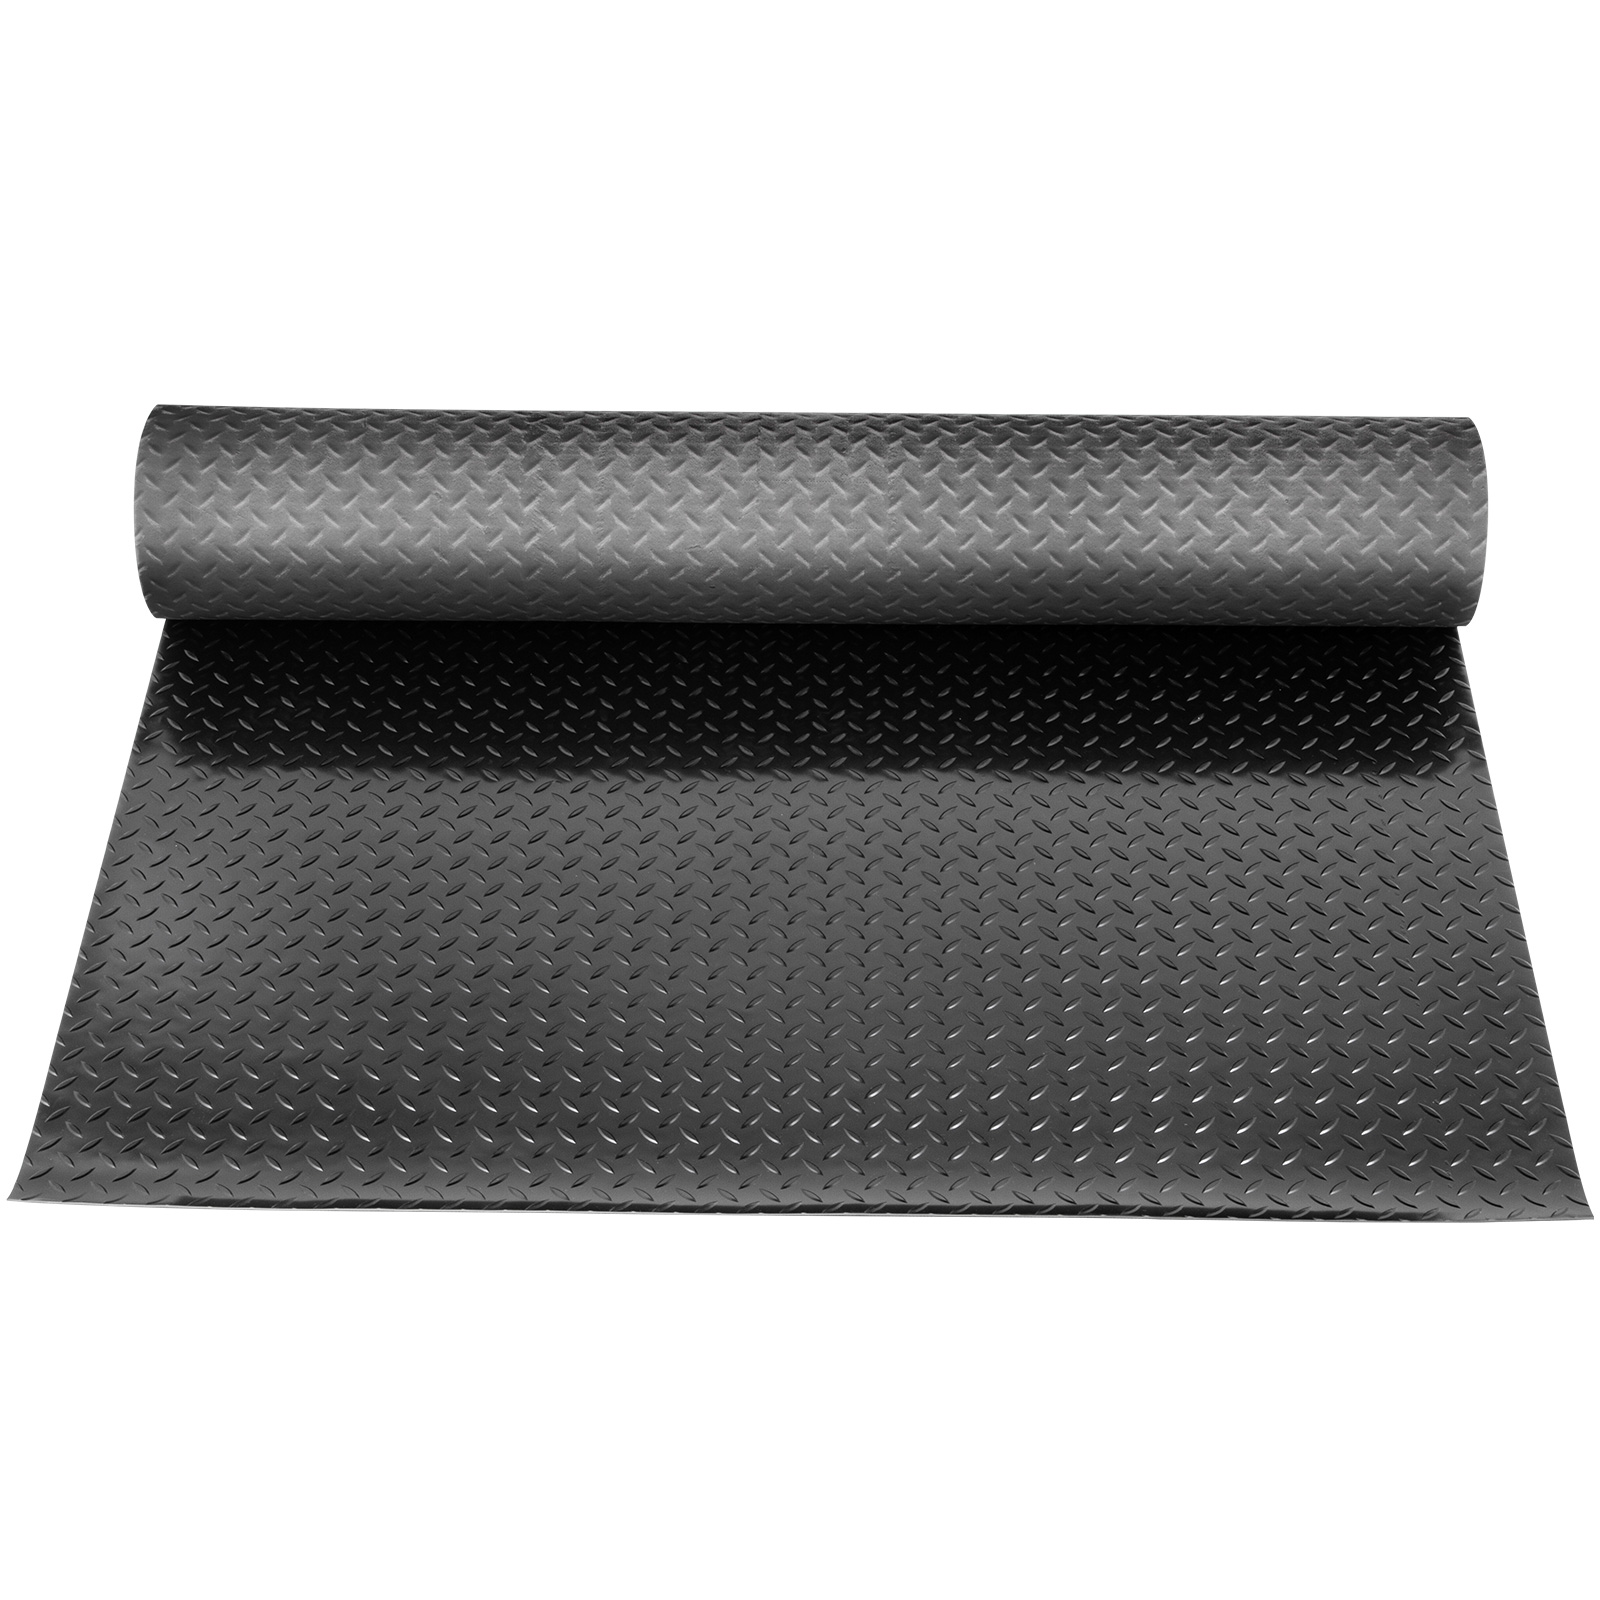 thumbnail 108 - Garage Flooring Mat Roll Car Trailer Floor Covering 1.1m Width Gym Floor Roll